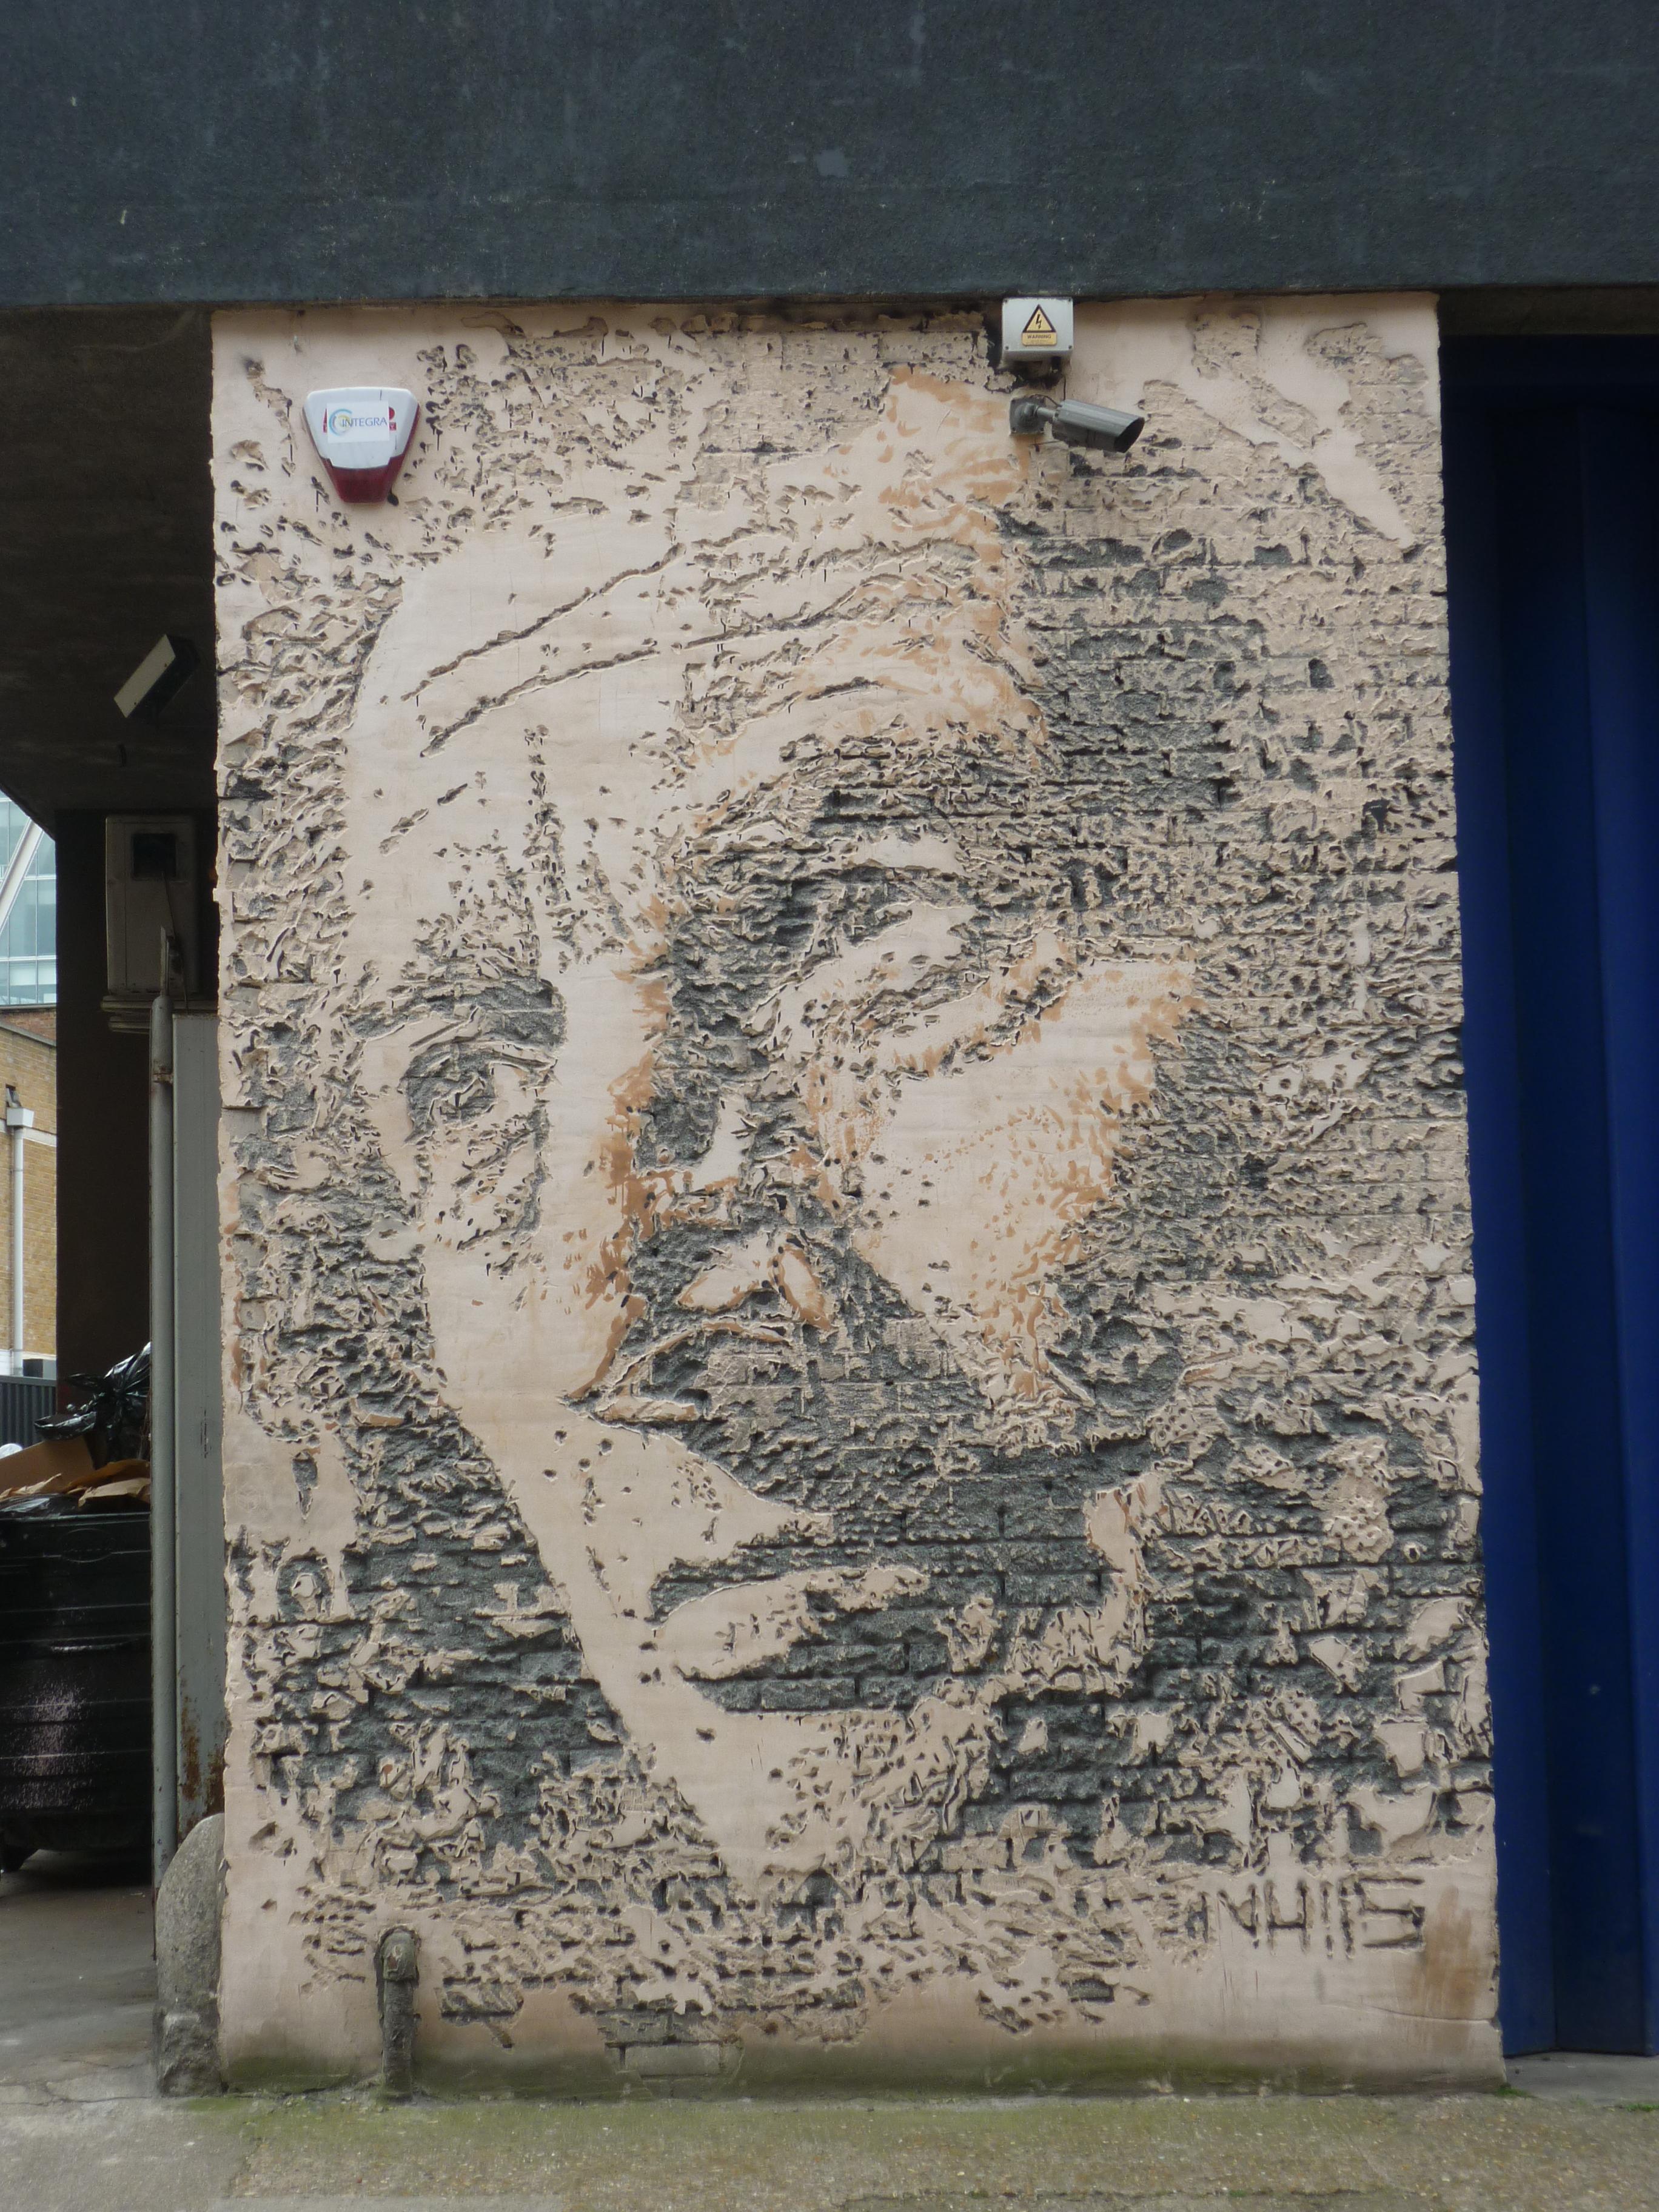 Shoreditch Street Art: O Is For Odd Balls, Old Street And Street Art